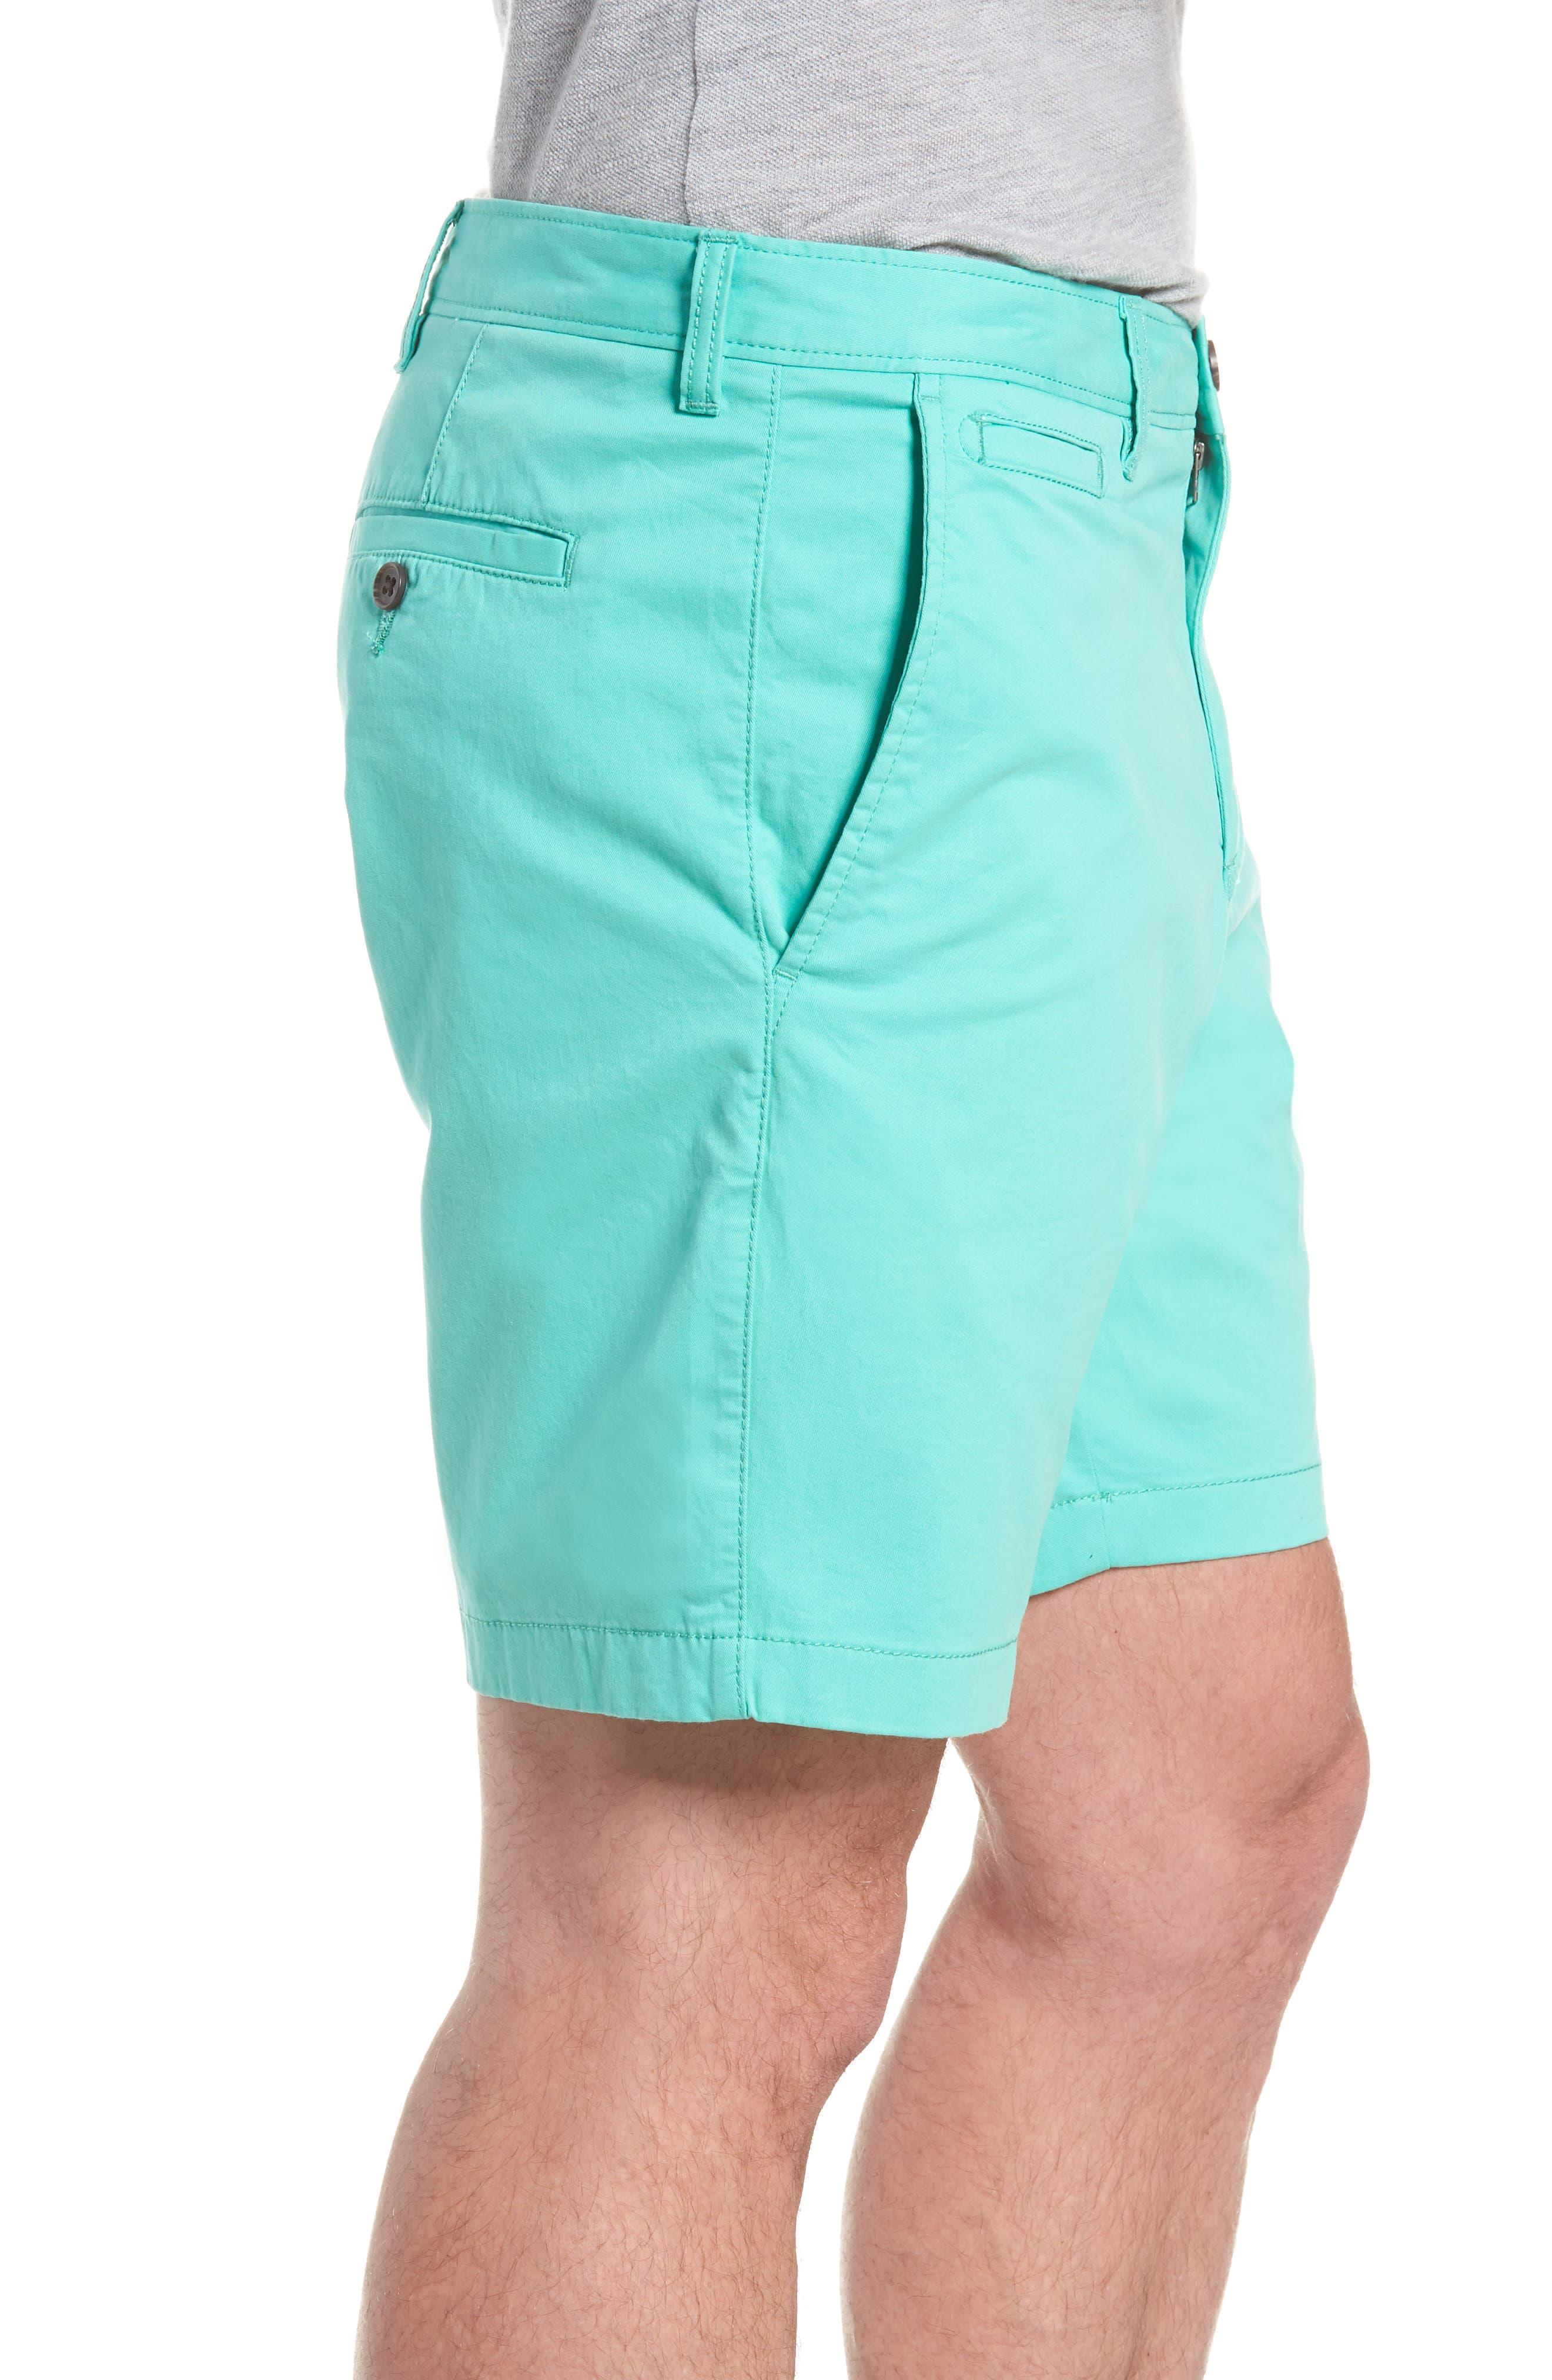 Ballard Slim Fit Stretch Chino 9-Inch Shorts,                             Alternate thumbnail 3, color,                             Green Largo